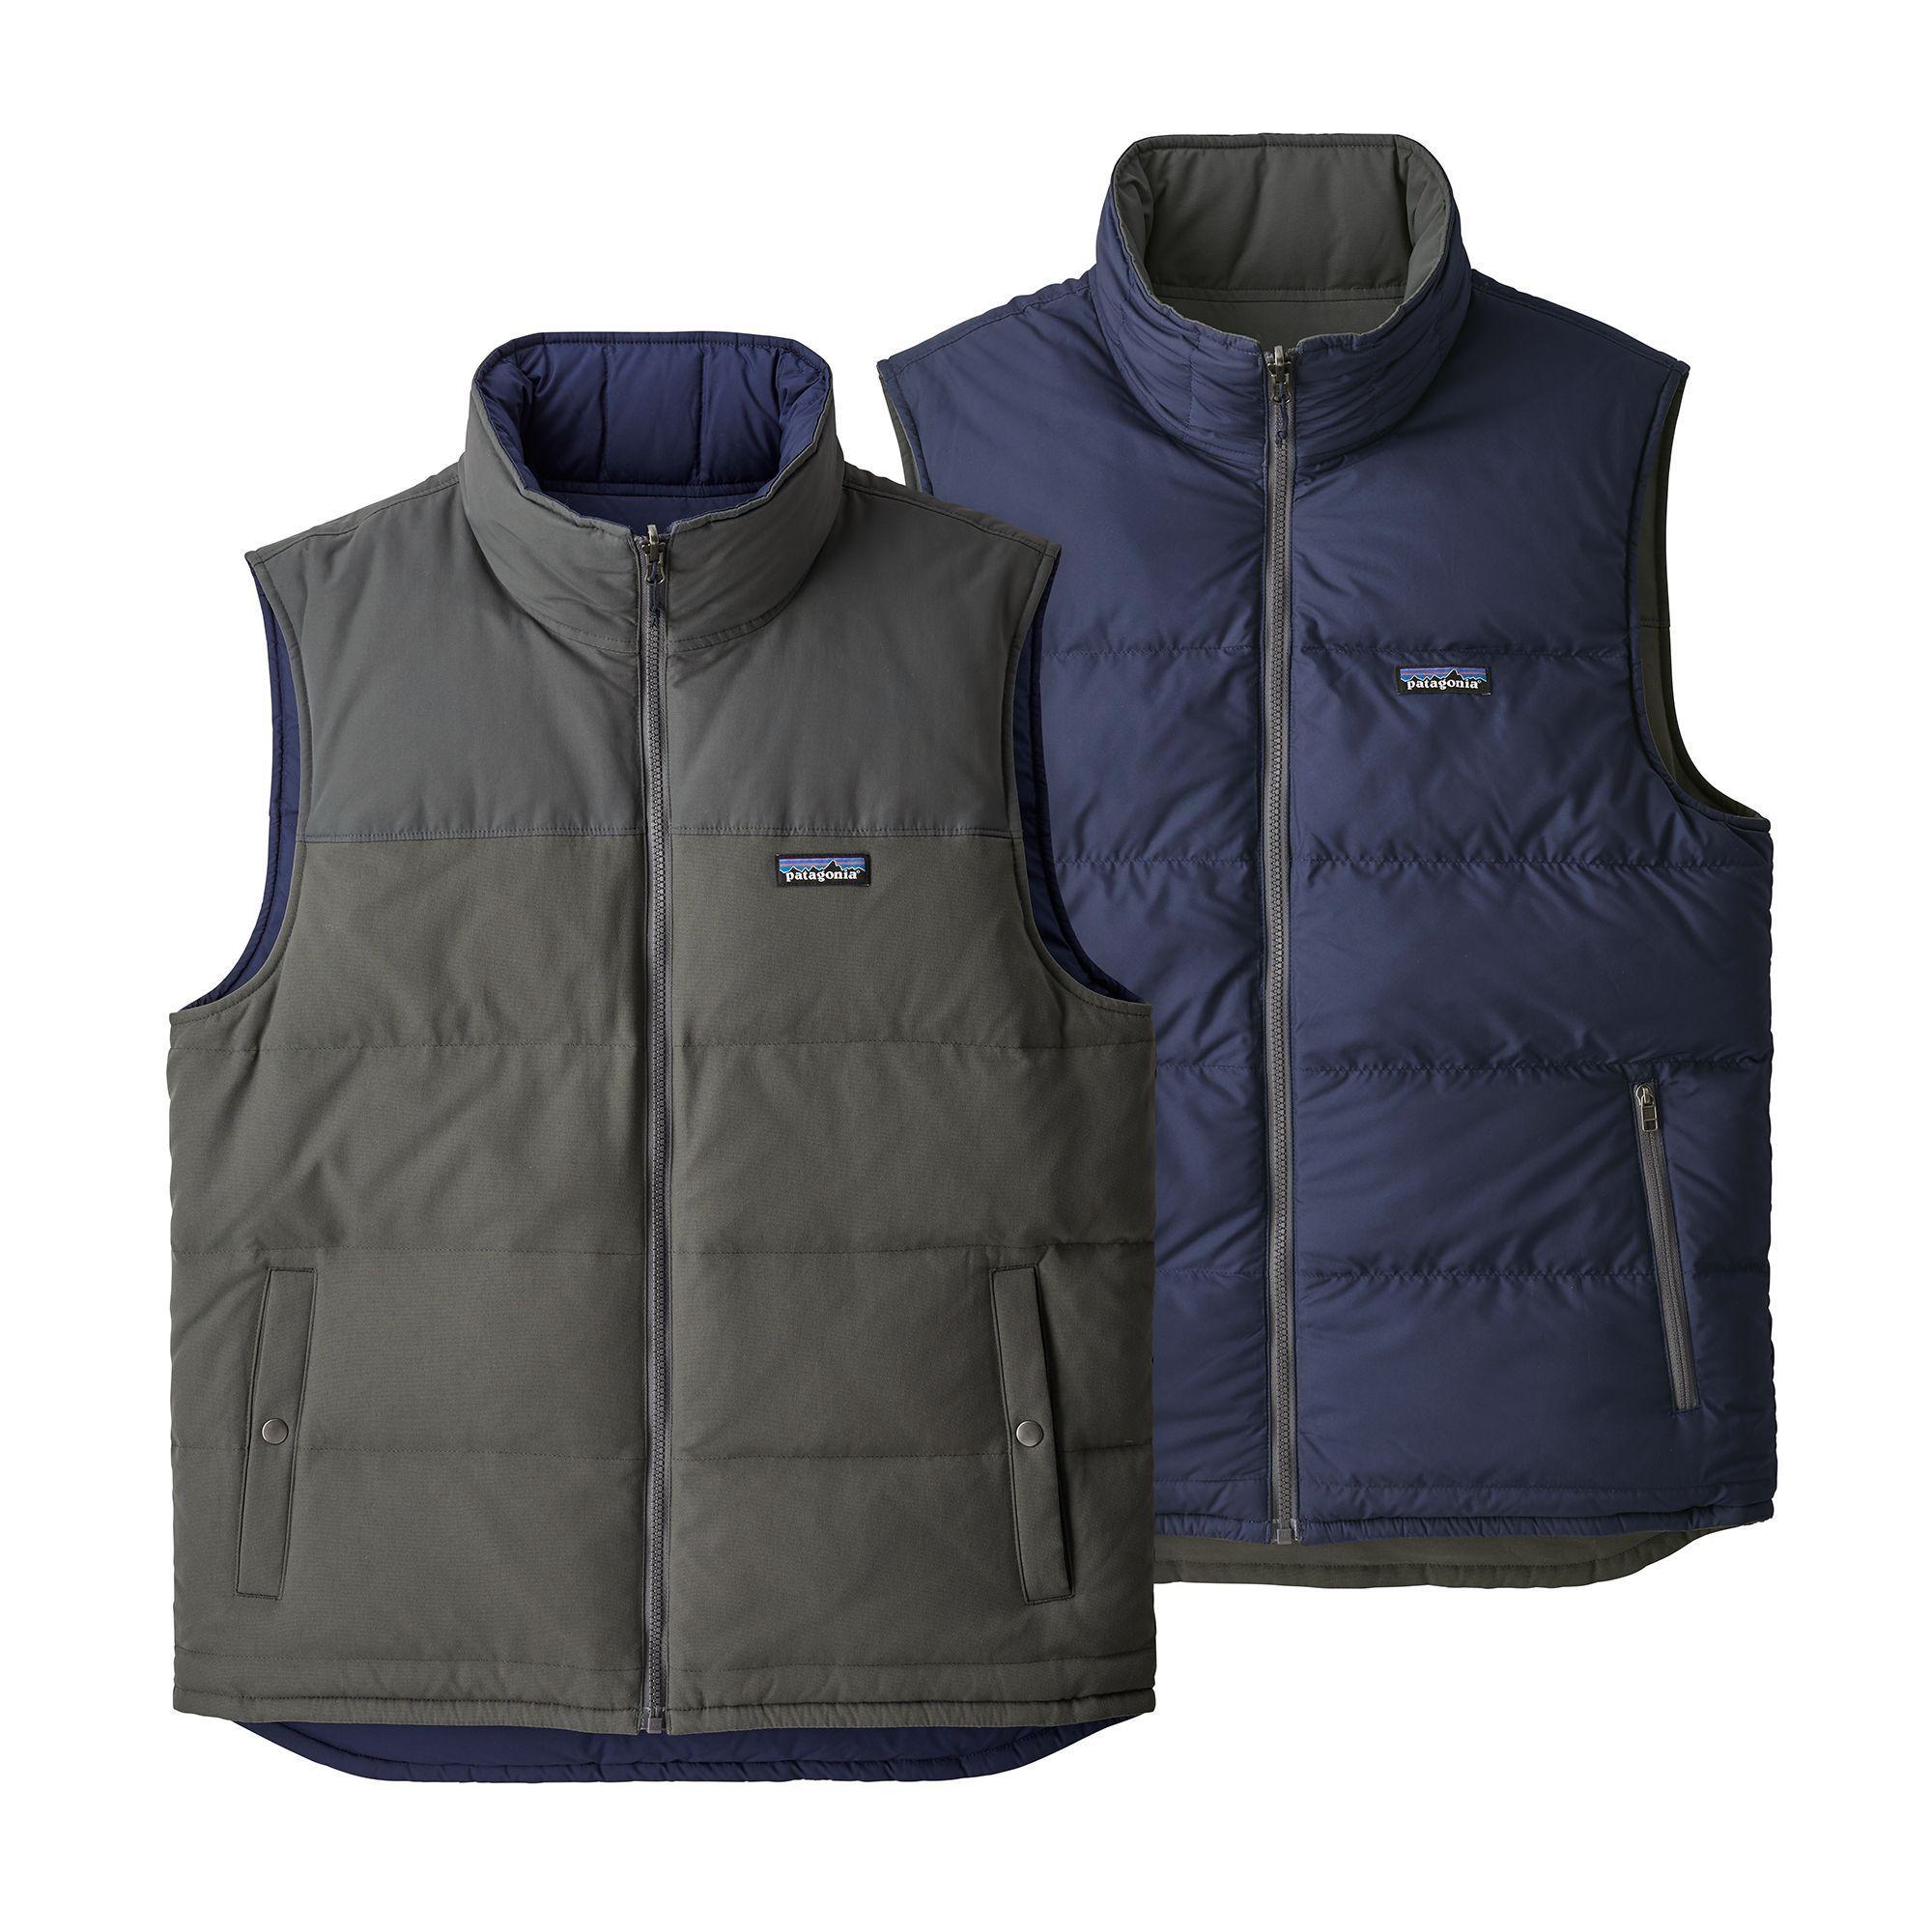 Patagonia Men's Reversible Bivy Down Vest | Veste ...